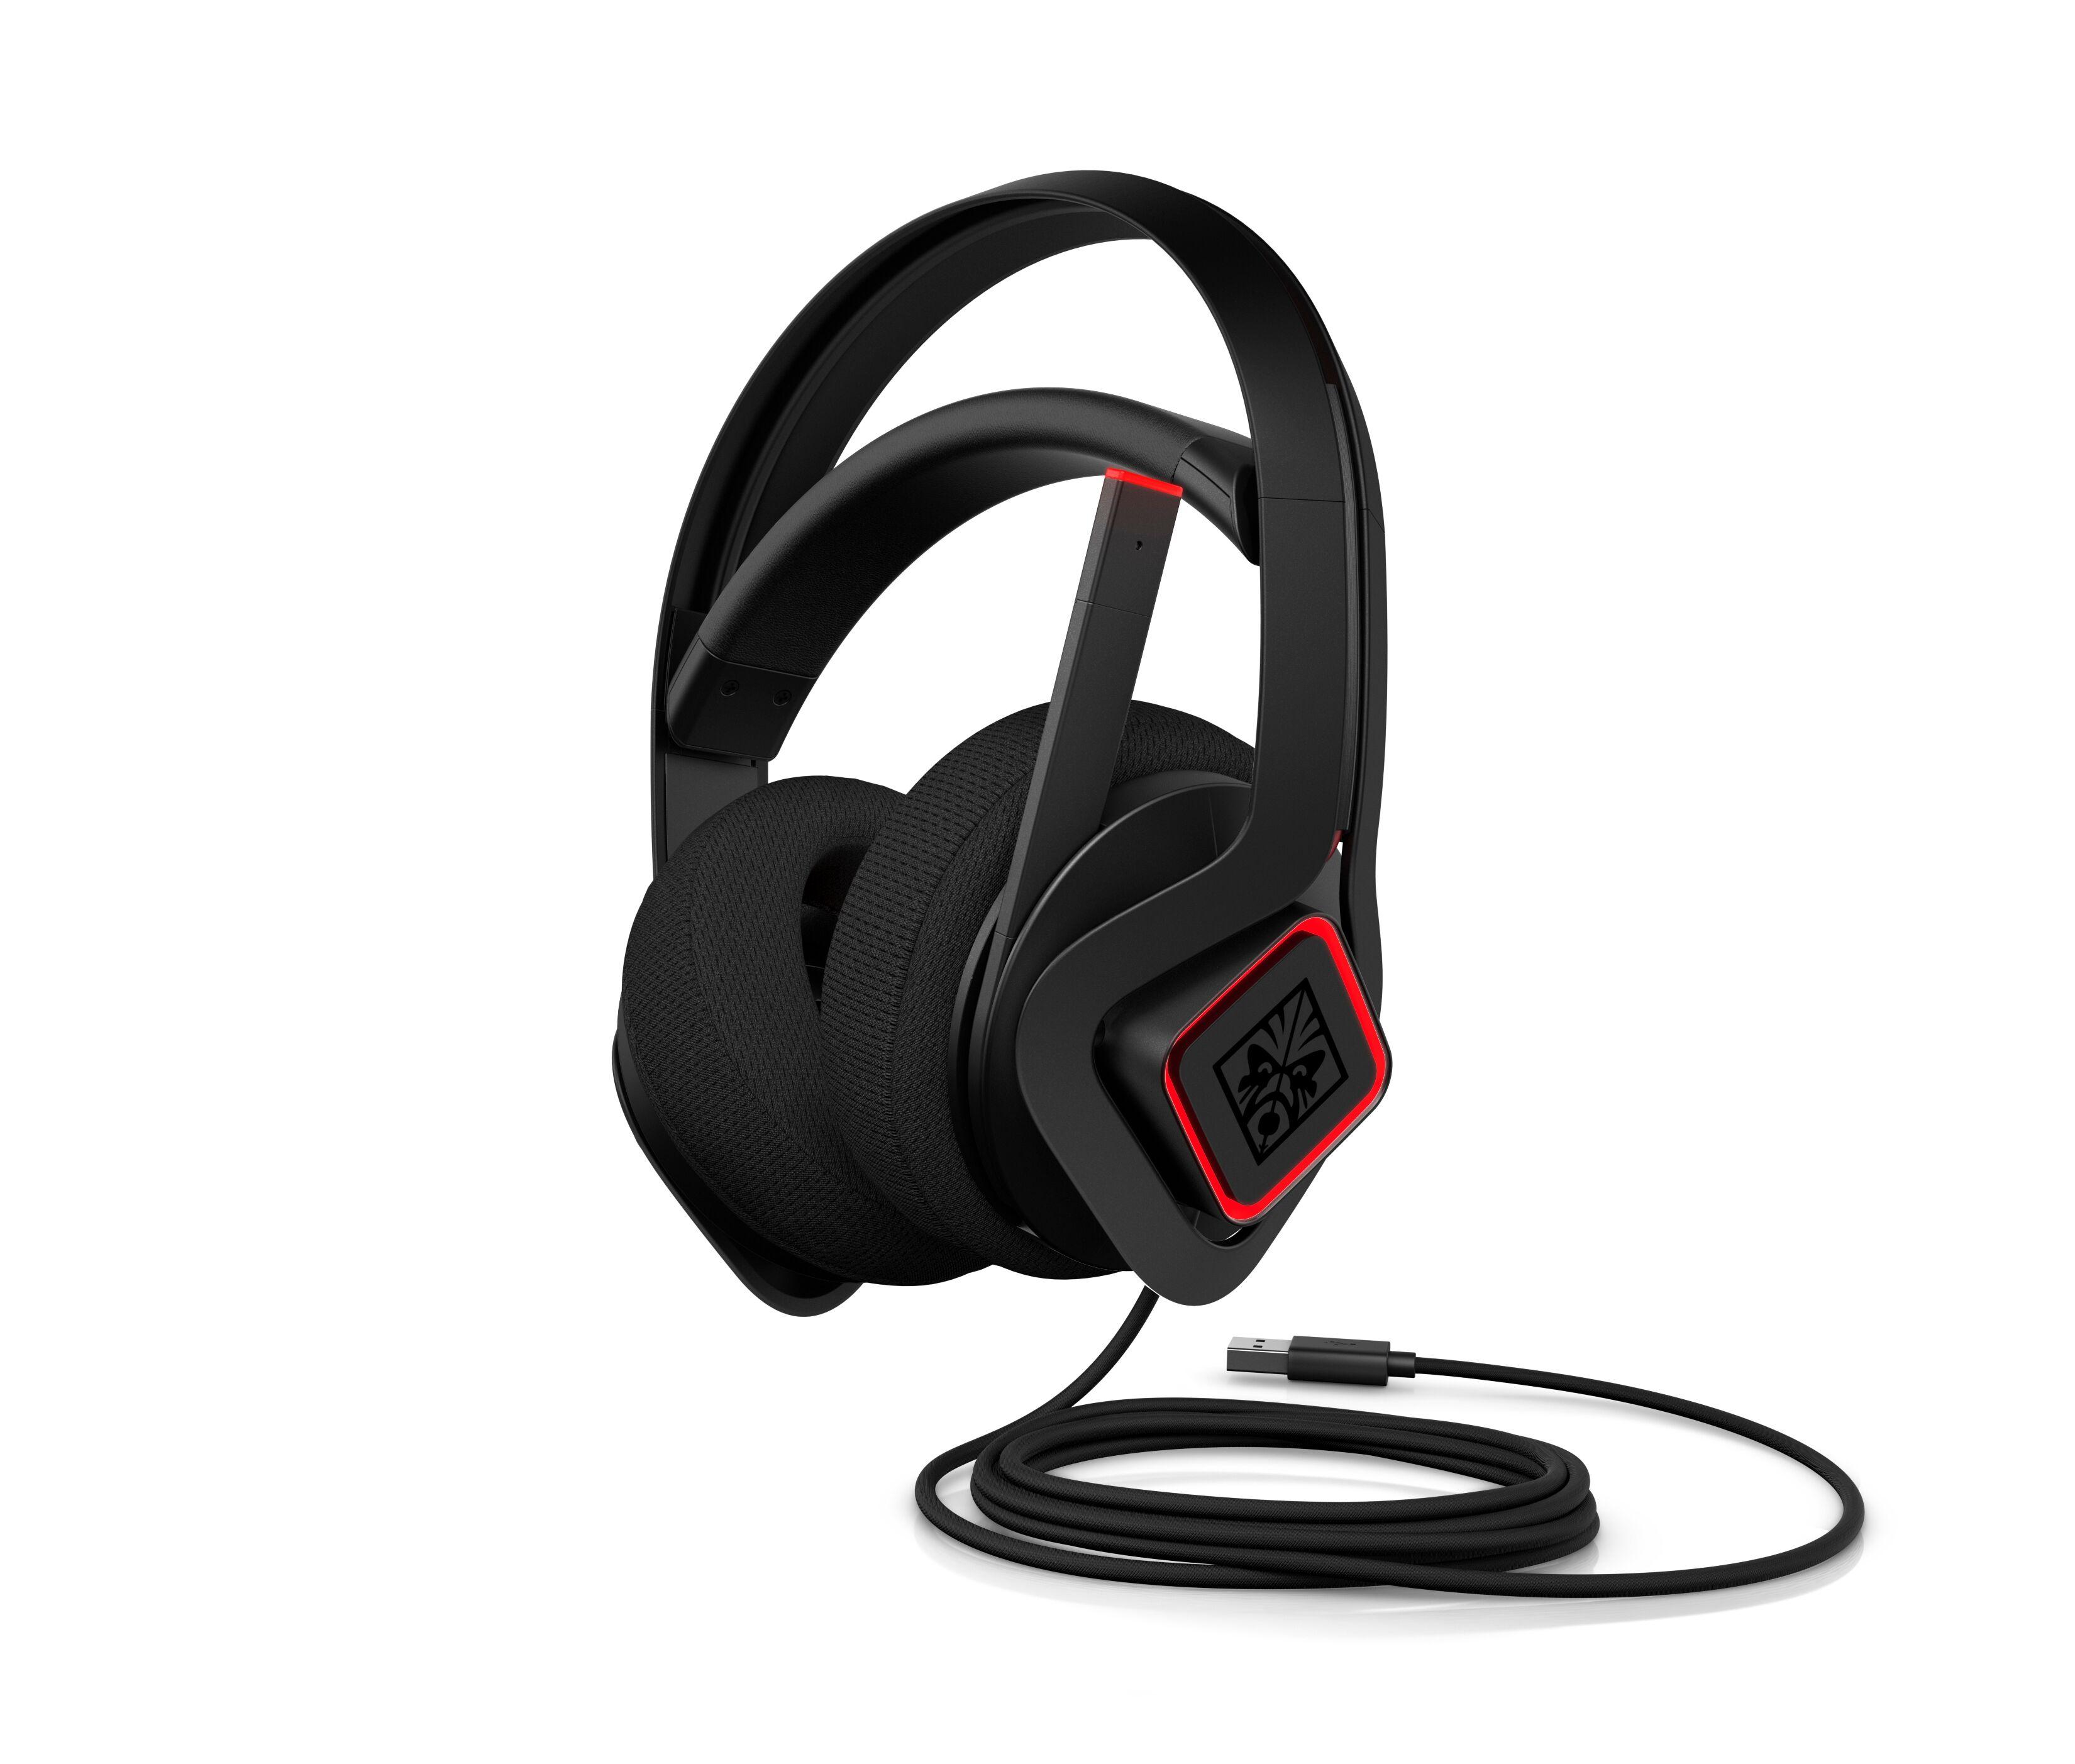 Gamescom 2019 - Mindframe Prime Headset 7 - Hynerd.it